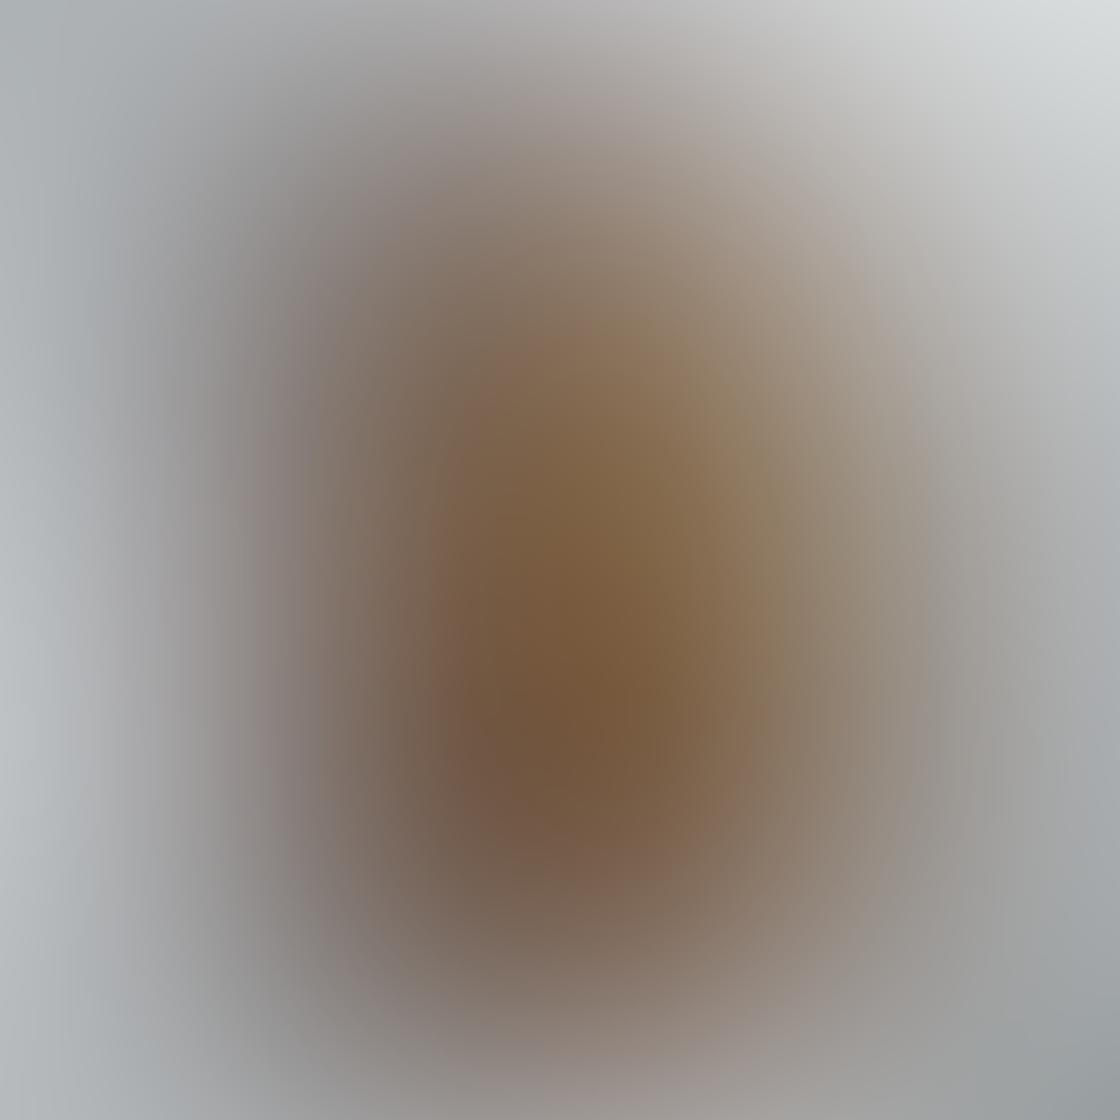 iPhone Photo Print Sizes 7